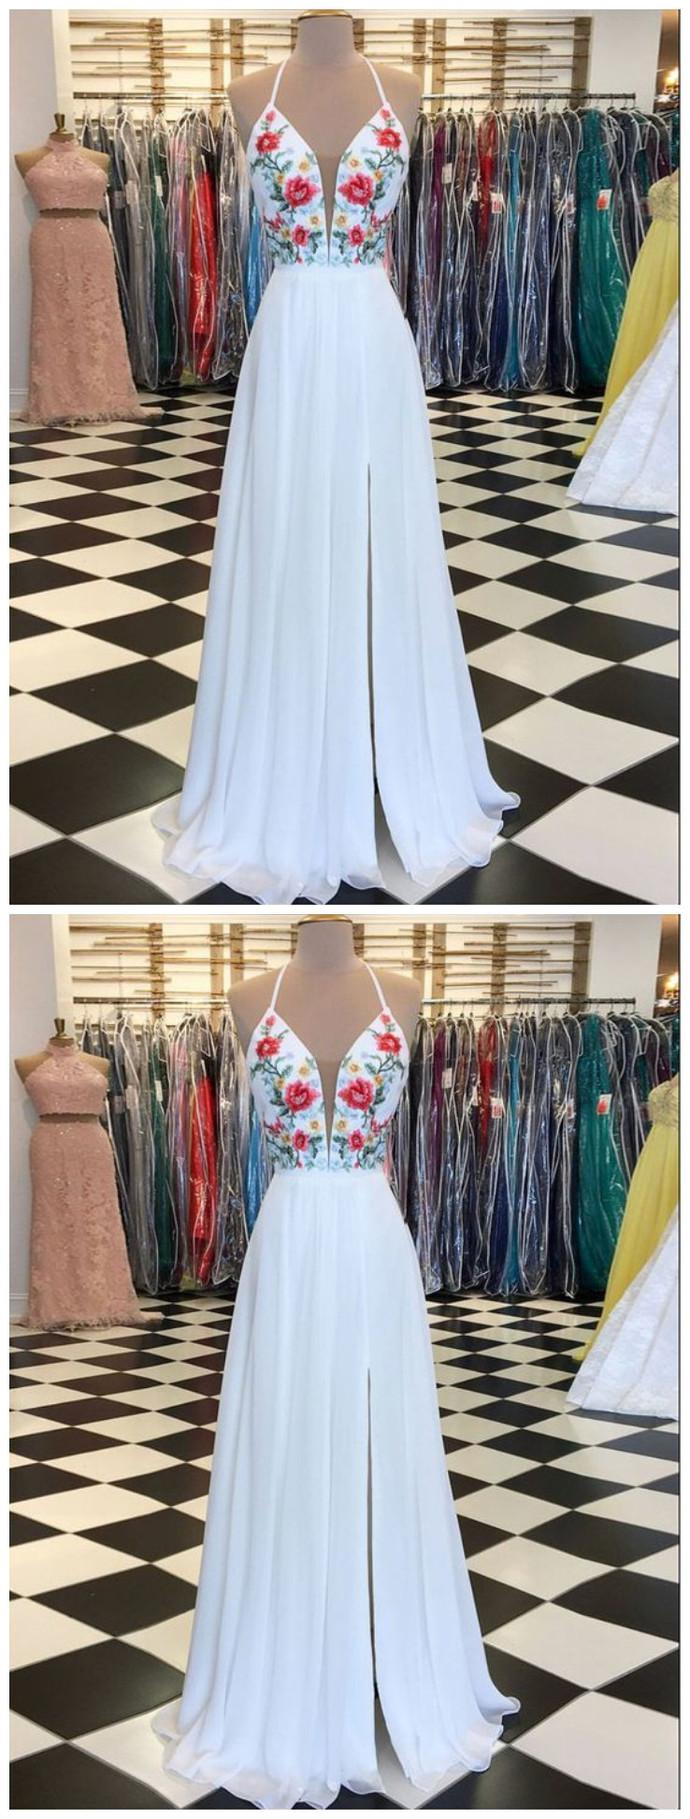 WHITE PROM DRESS A-LINE FLORAL EMBROIDERY SPAGHETTI STRAPS ELEGANT PROM DRESSES